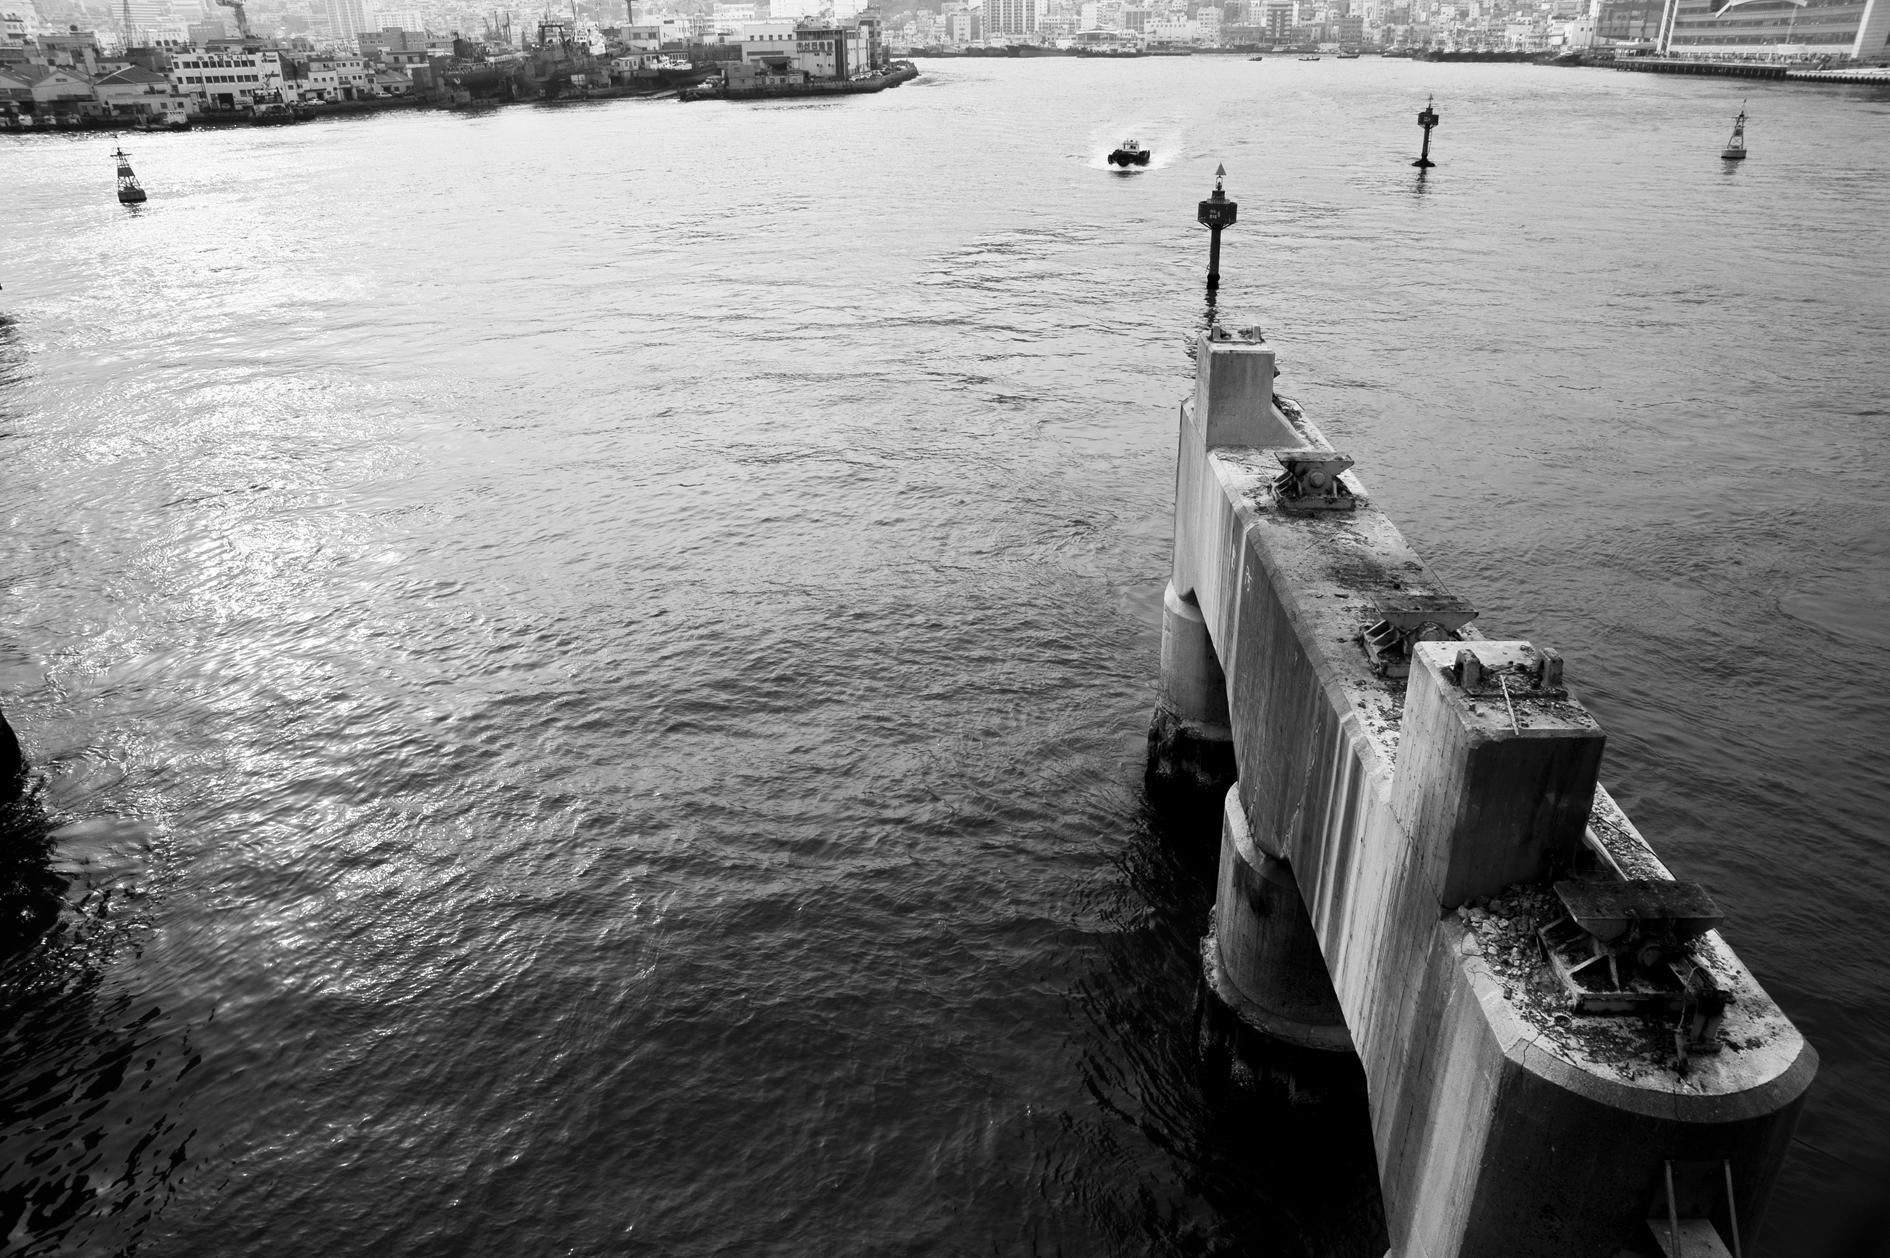 gray-부산 영도다리 2011 #11.jpg